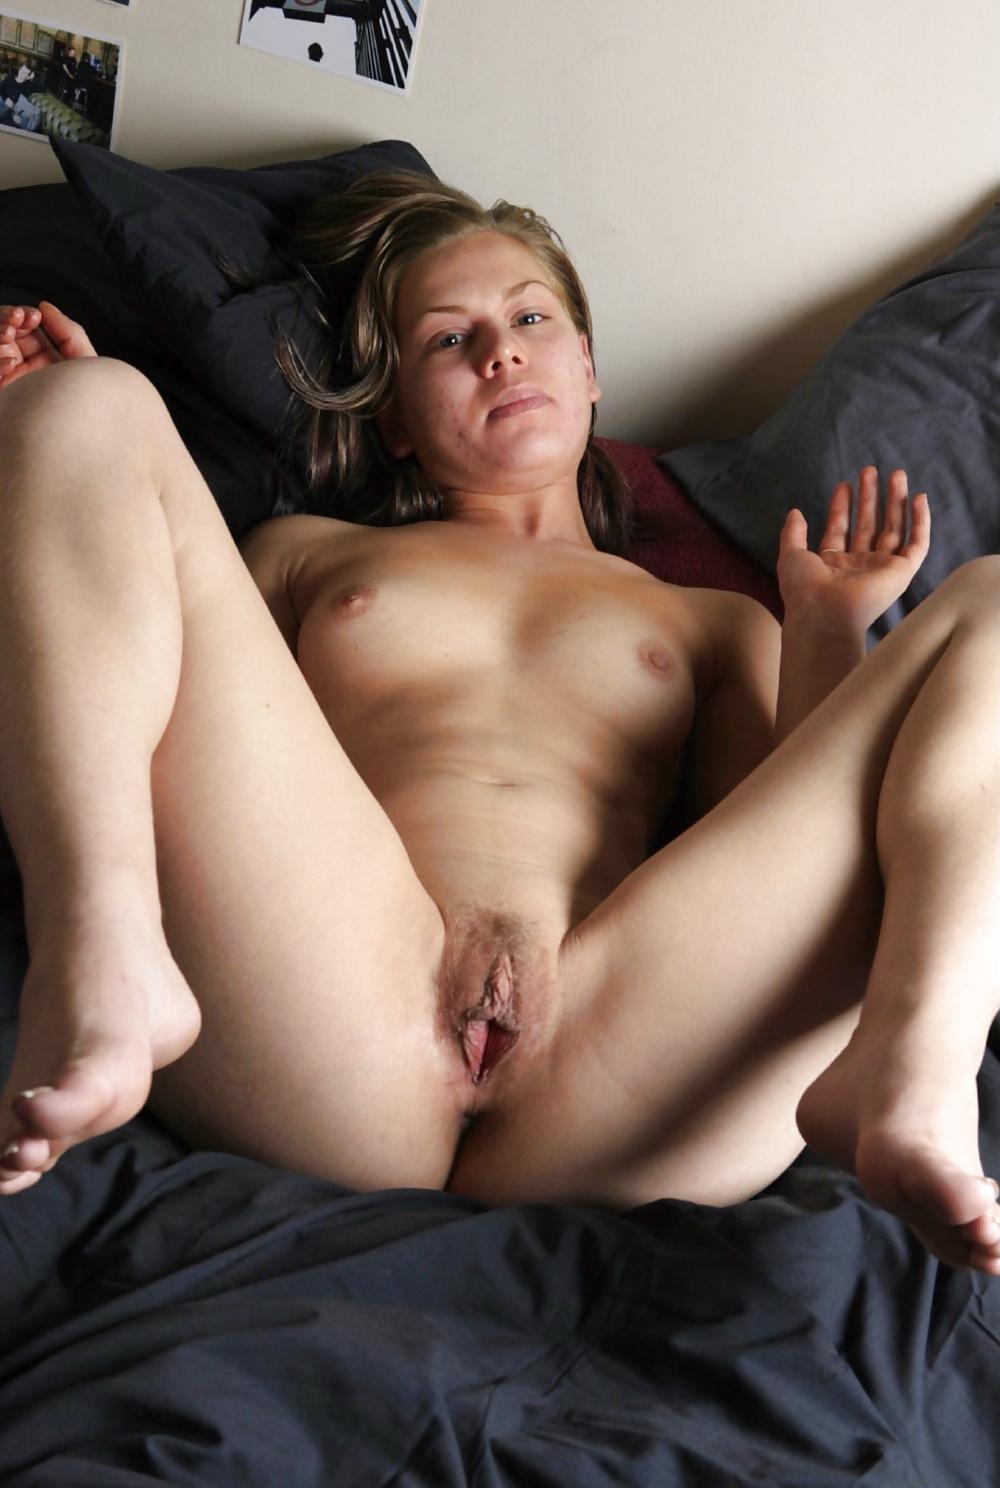 girl-next-door-porn-galleries-naked-chicks-in-the-shower